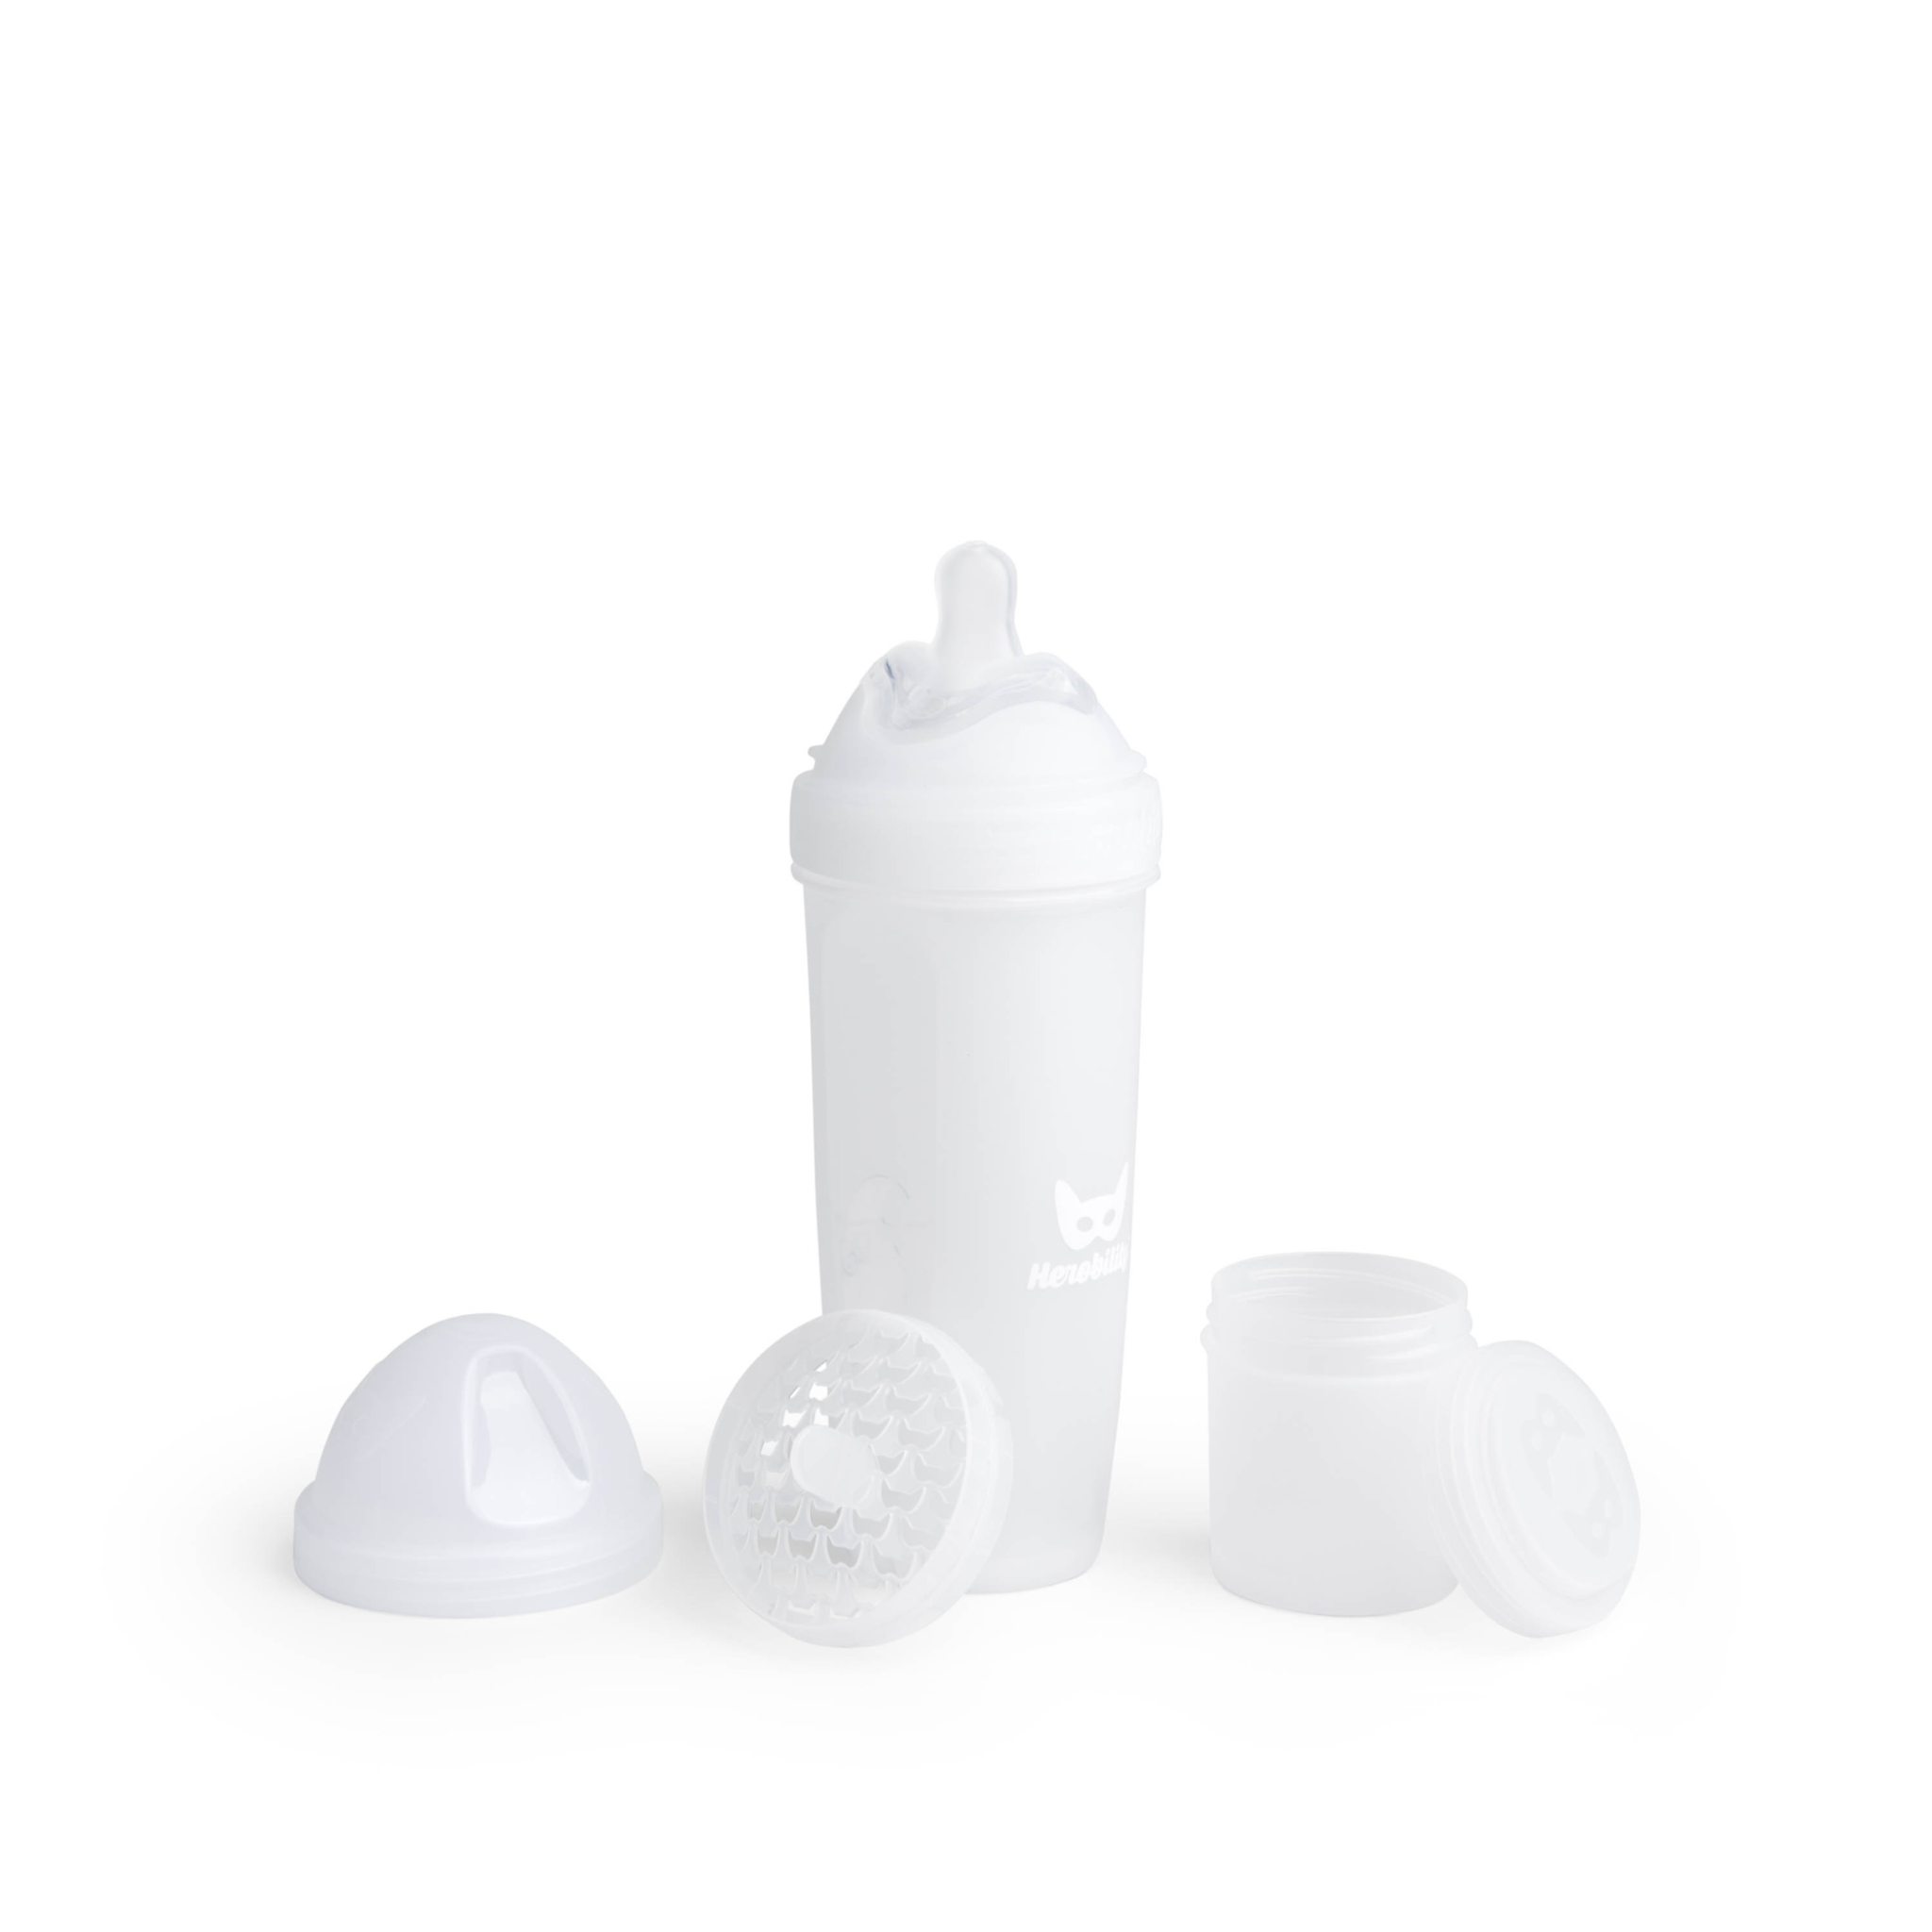 Herobility - butelka antykolkowa Herobottle 340 ml, biała + smoczek L (4 m+)